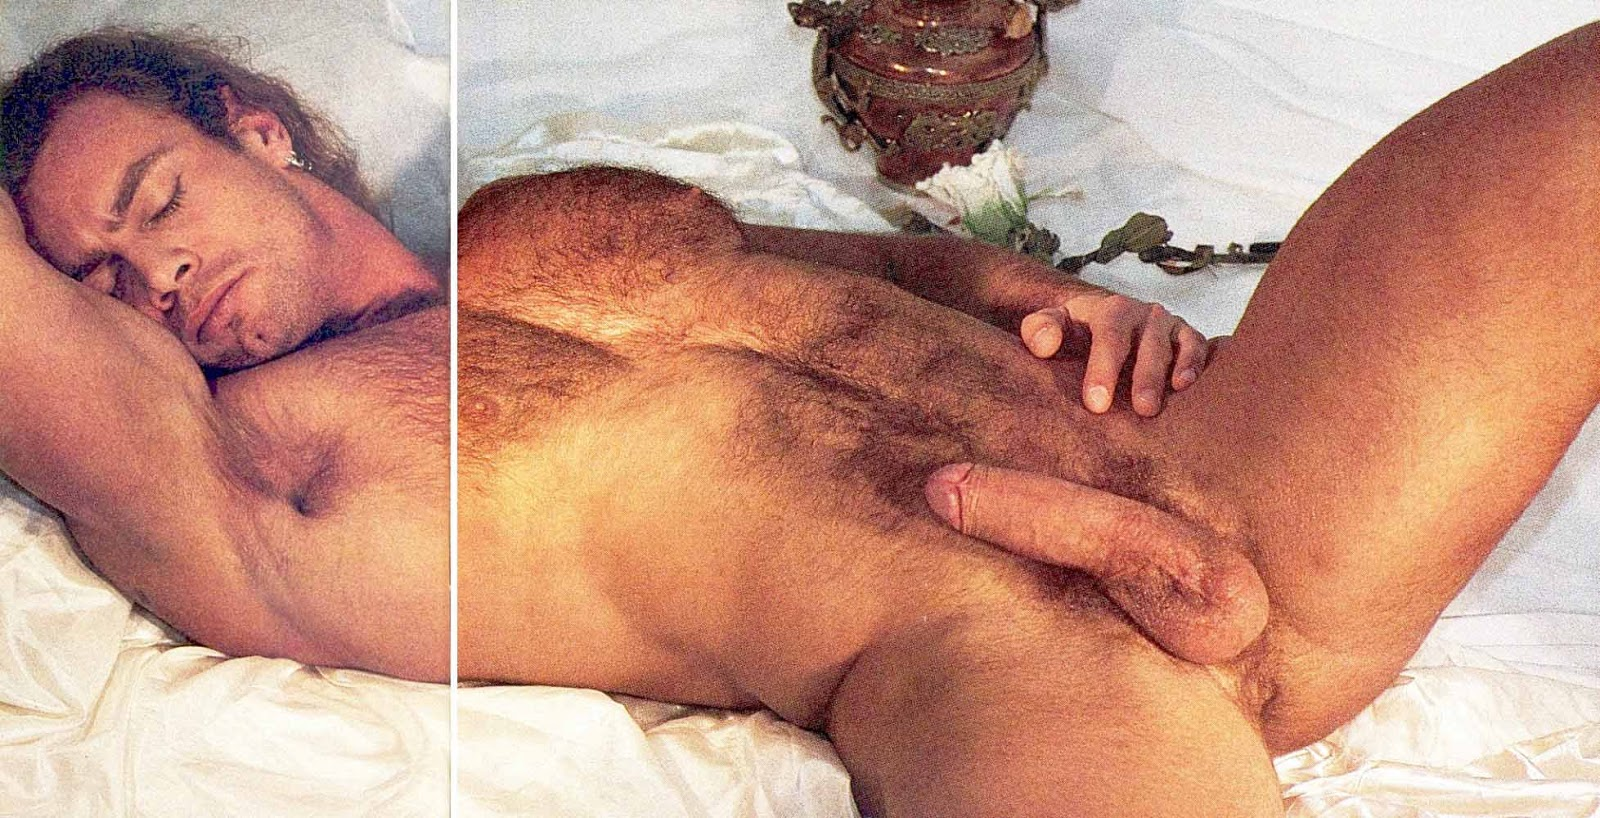 gay Pete nude meluso